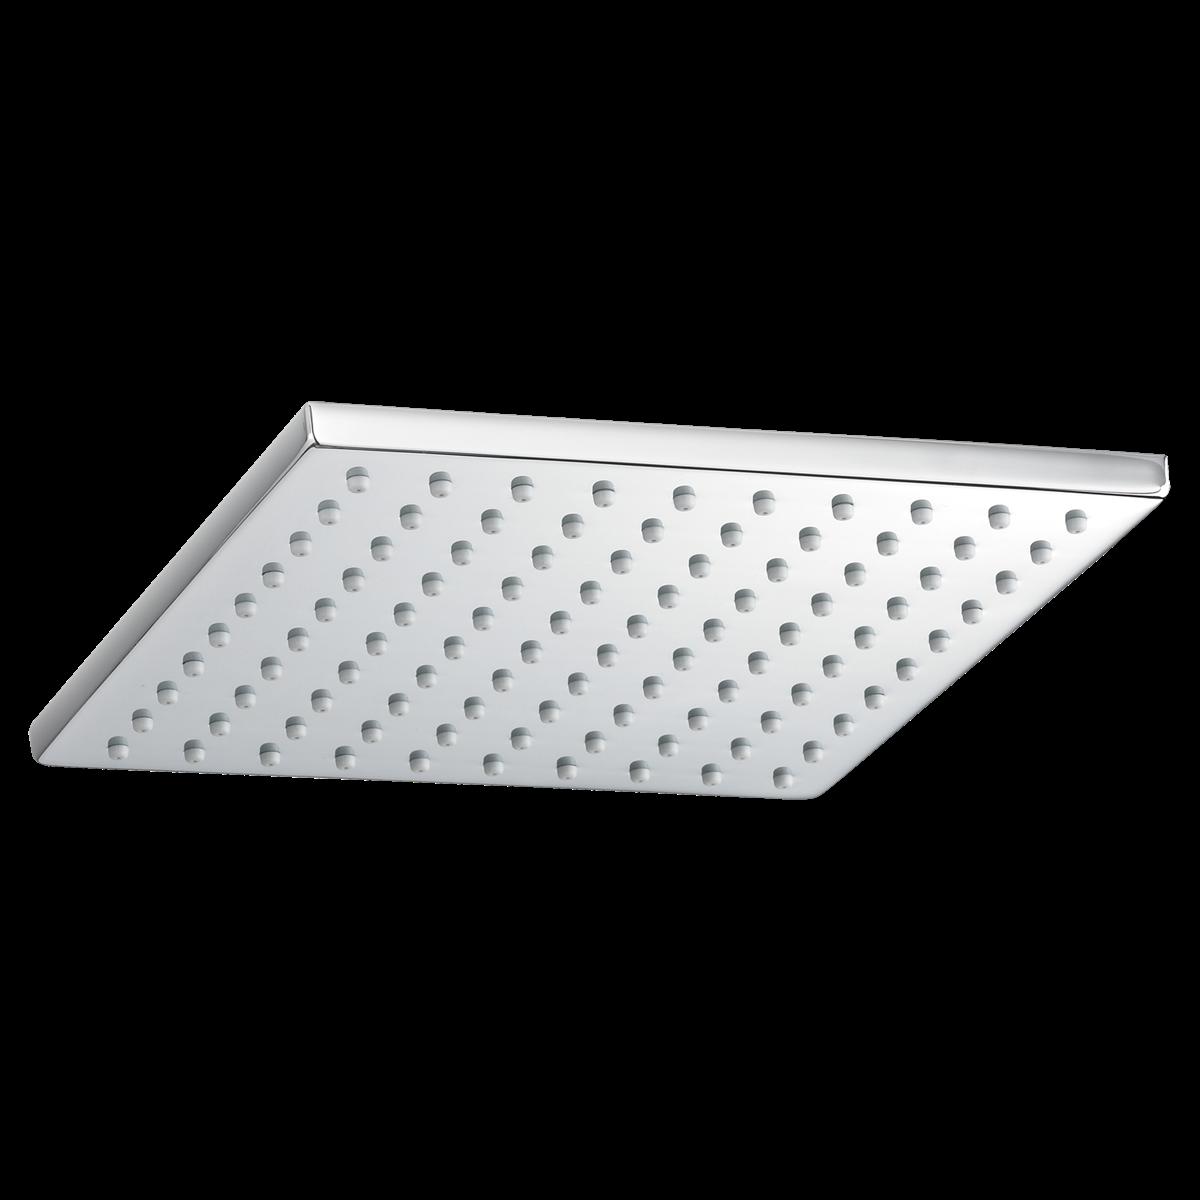 Shower Faucets 8 Inch Square Rain Showerhead Polished Chrome